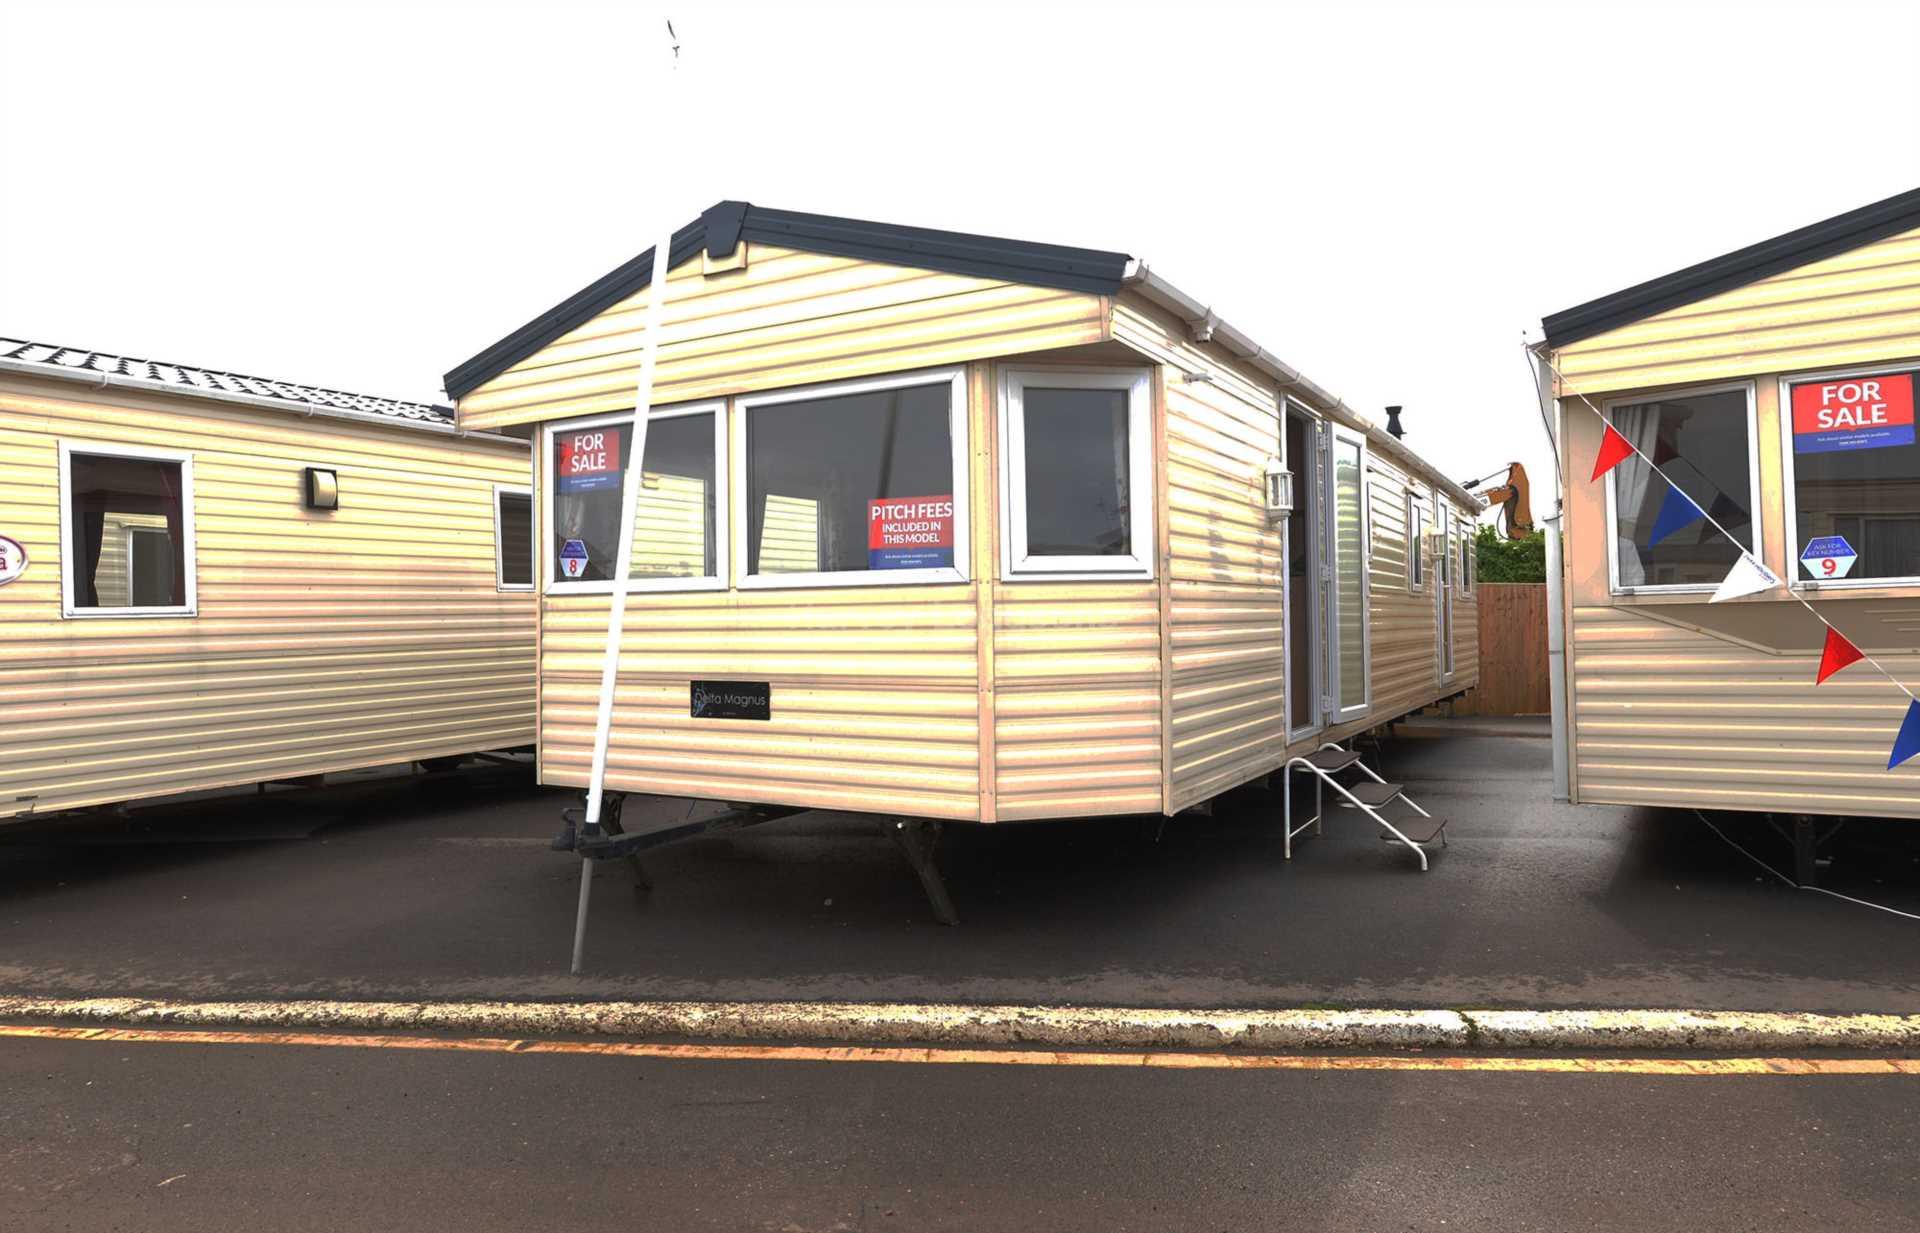 Fantastic Bedroom Caravan For Sale Harts Holiday Park Leysdown Road Leysdown